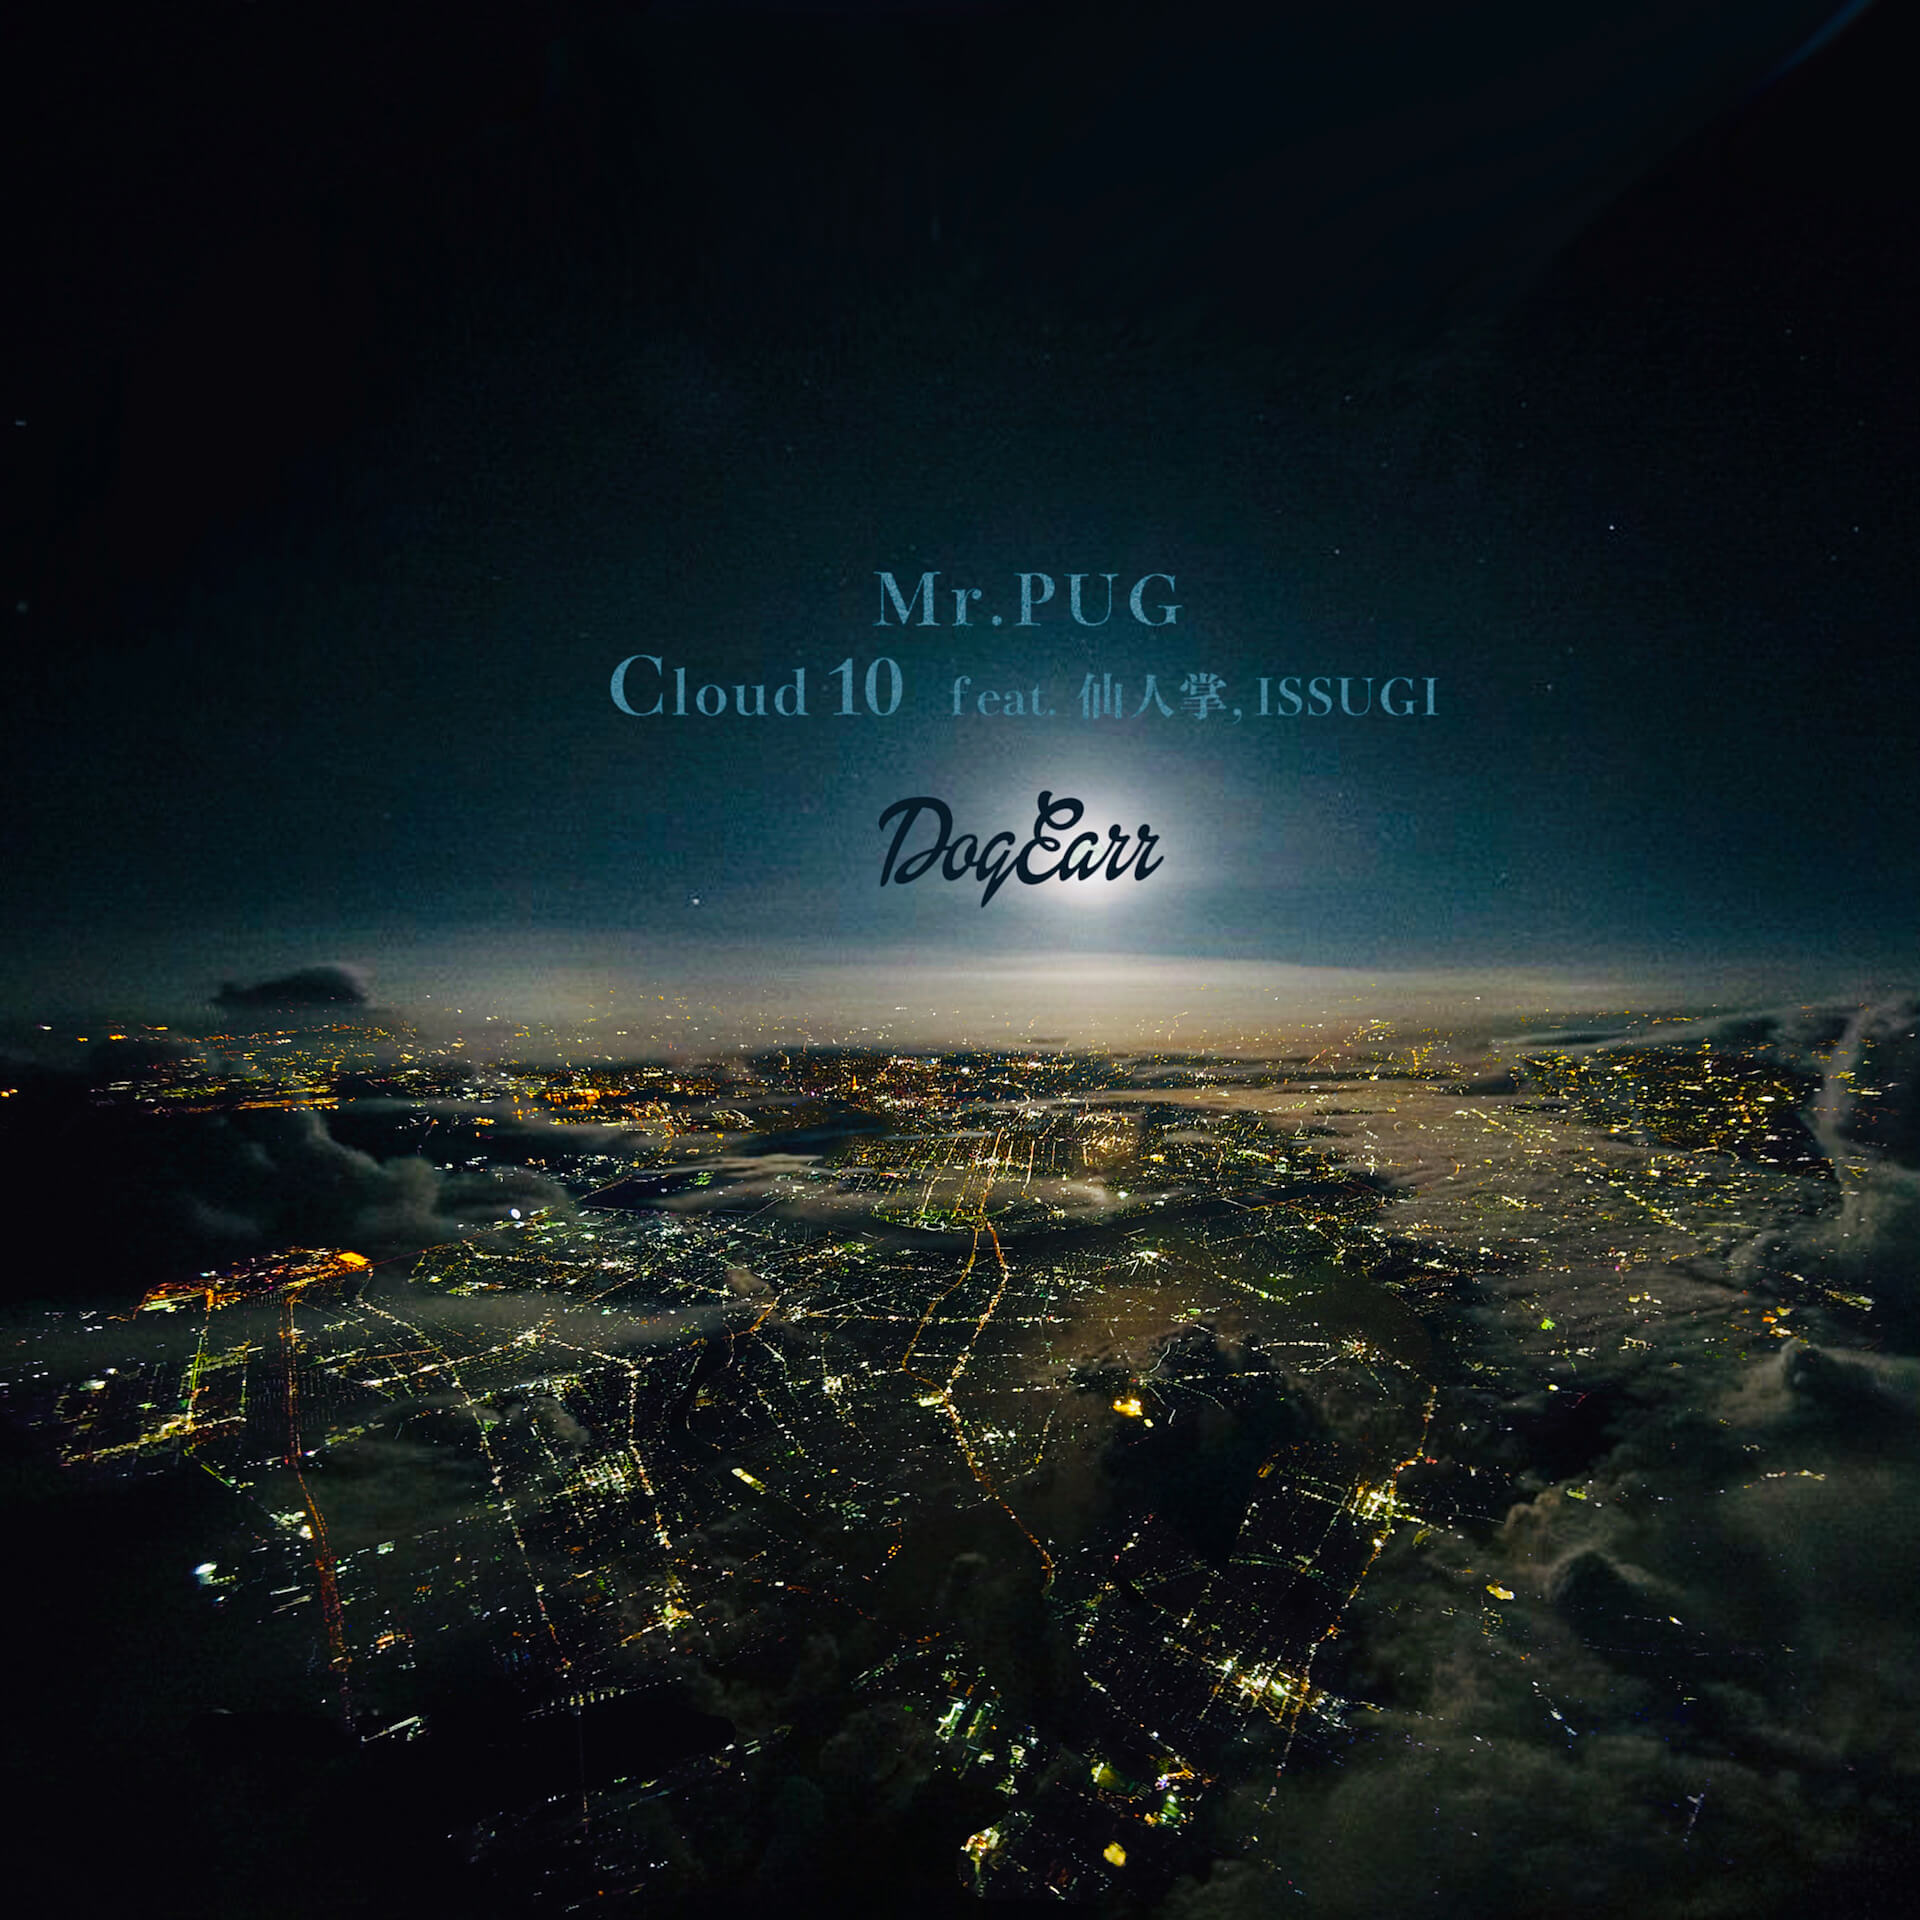 Mr.PUG、仙人掌とISSUGIを客演に迎えた新曲「Cloud10」をリリース|ビートはDJ GQ music200421-mrpug